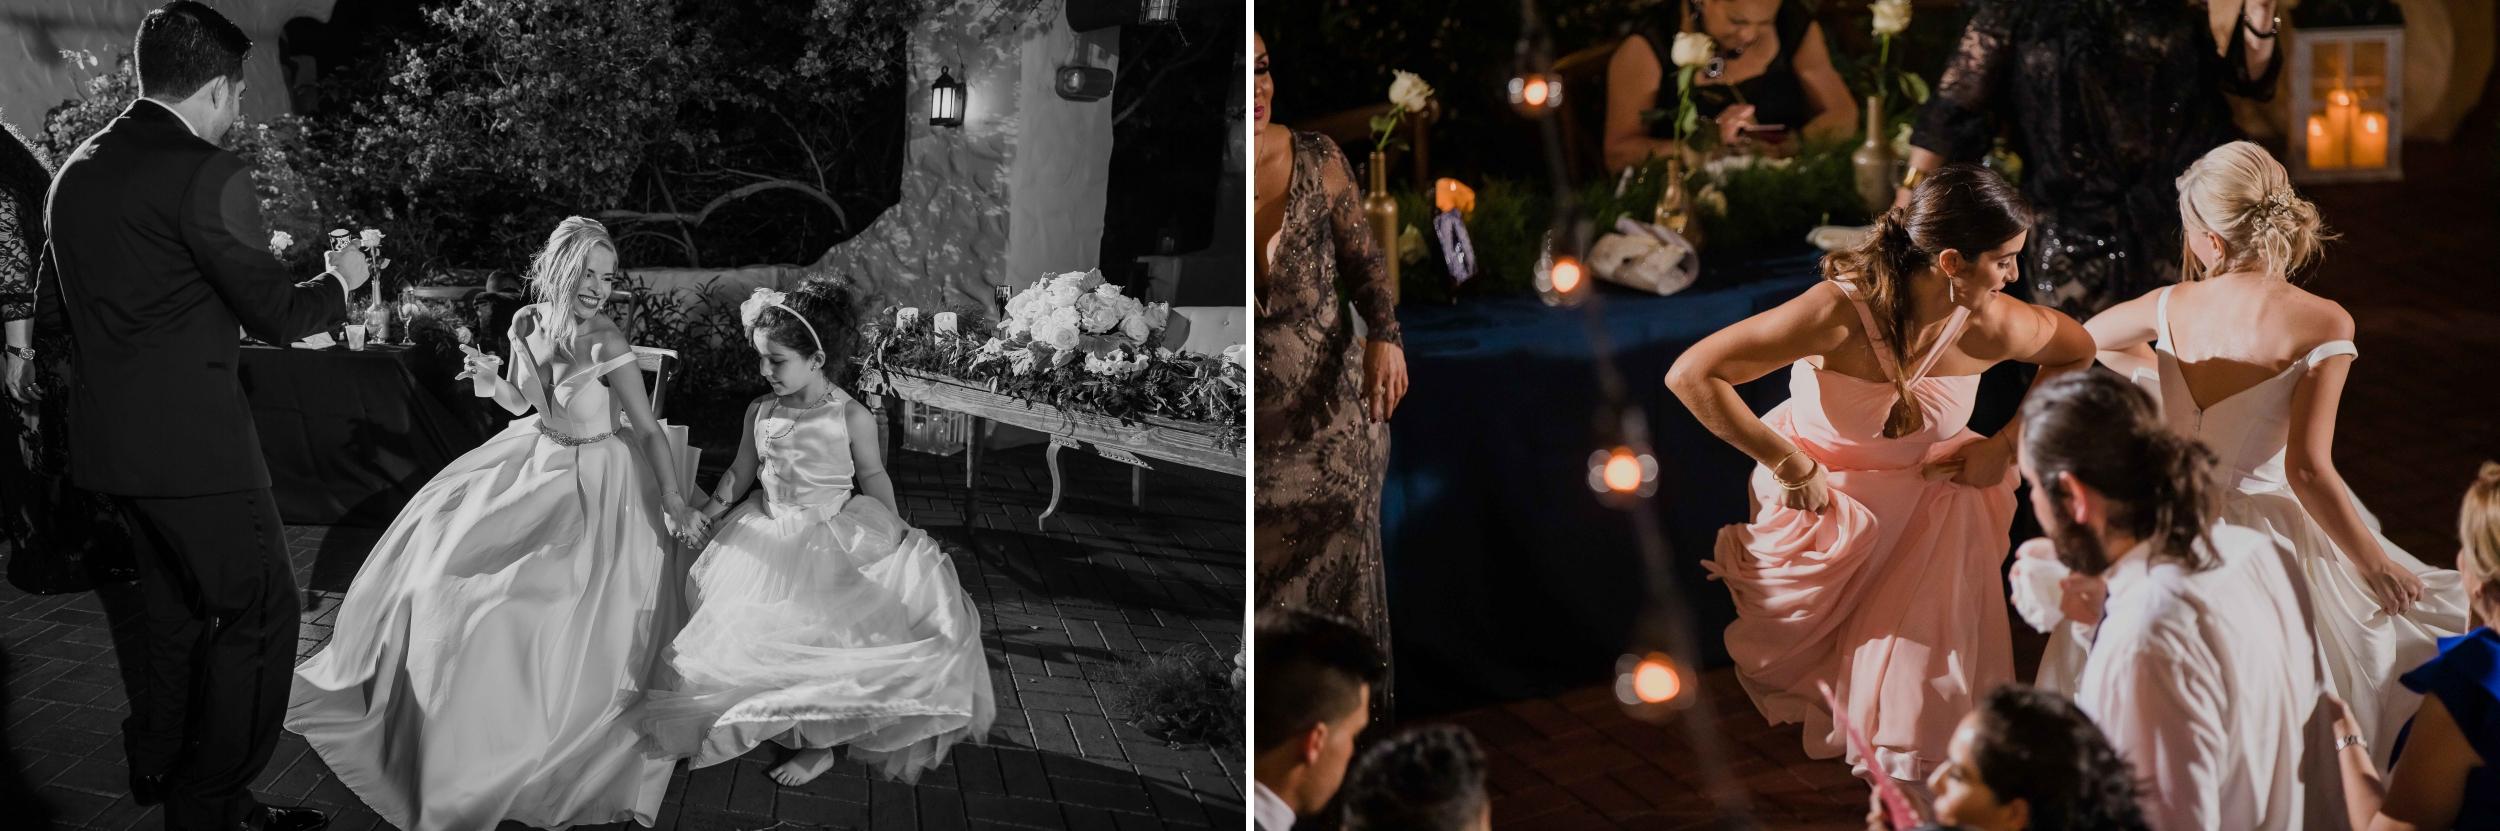 Santy Martinez - Curtiss Masion Wedding 20.jpg